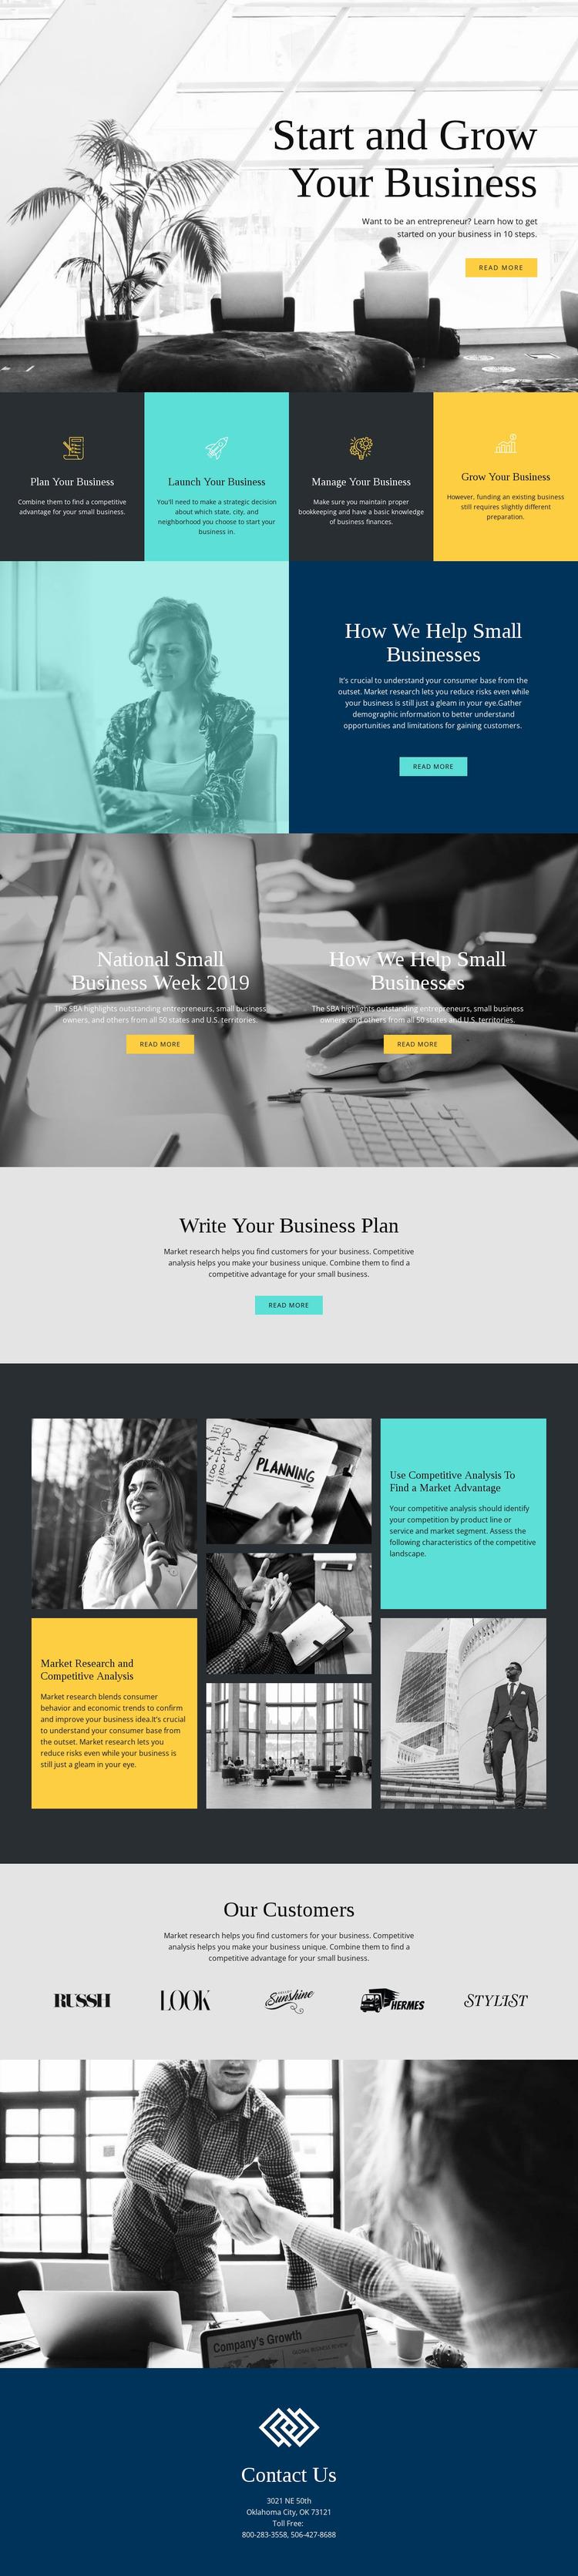 Start and grow your business WordPress Website Builder